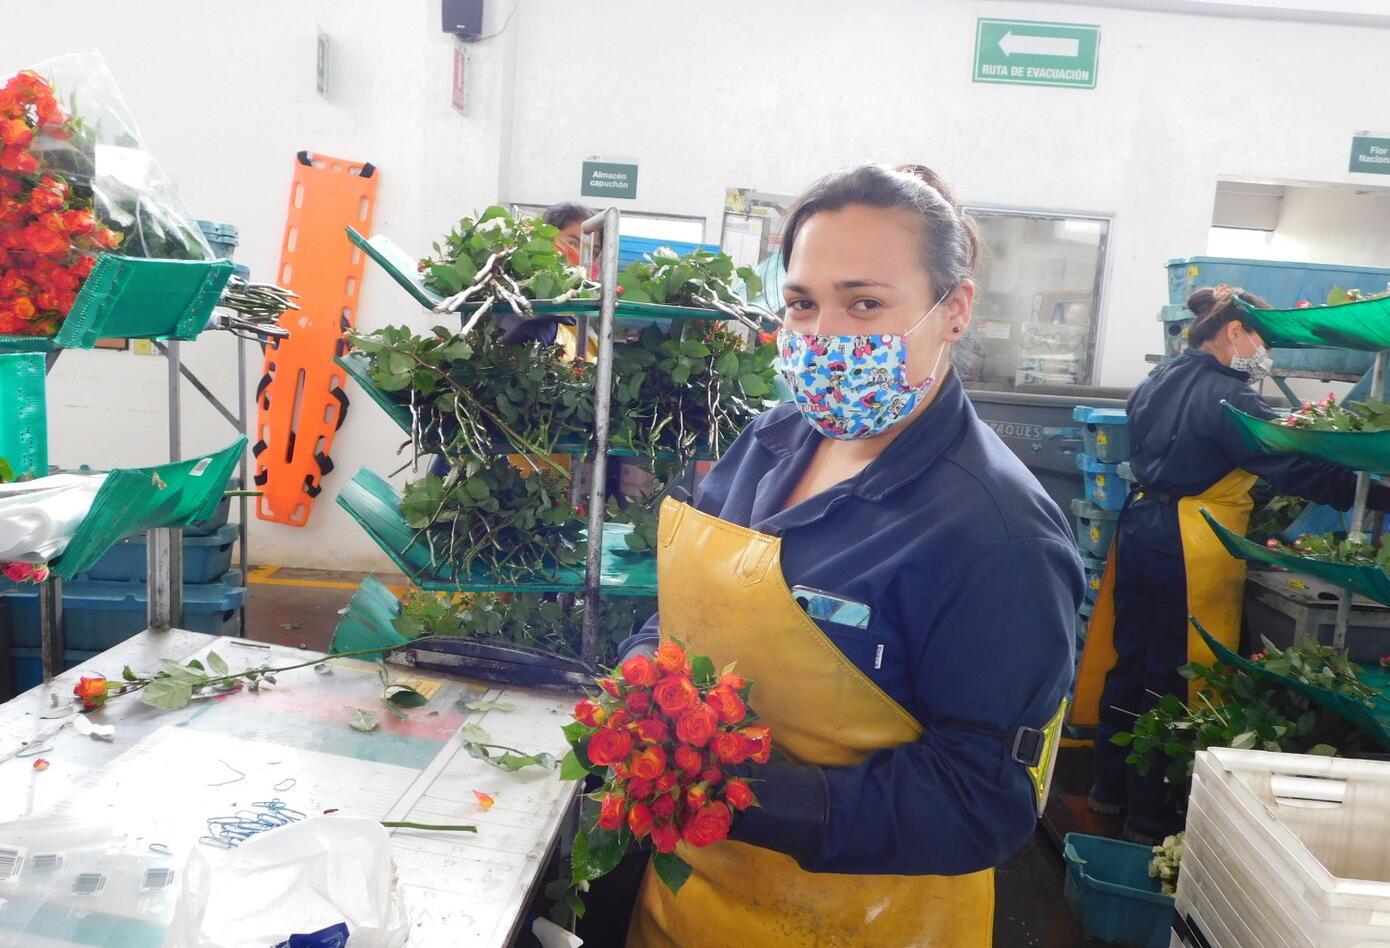 Empresa cultivadora de flores colombiana.